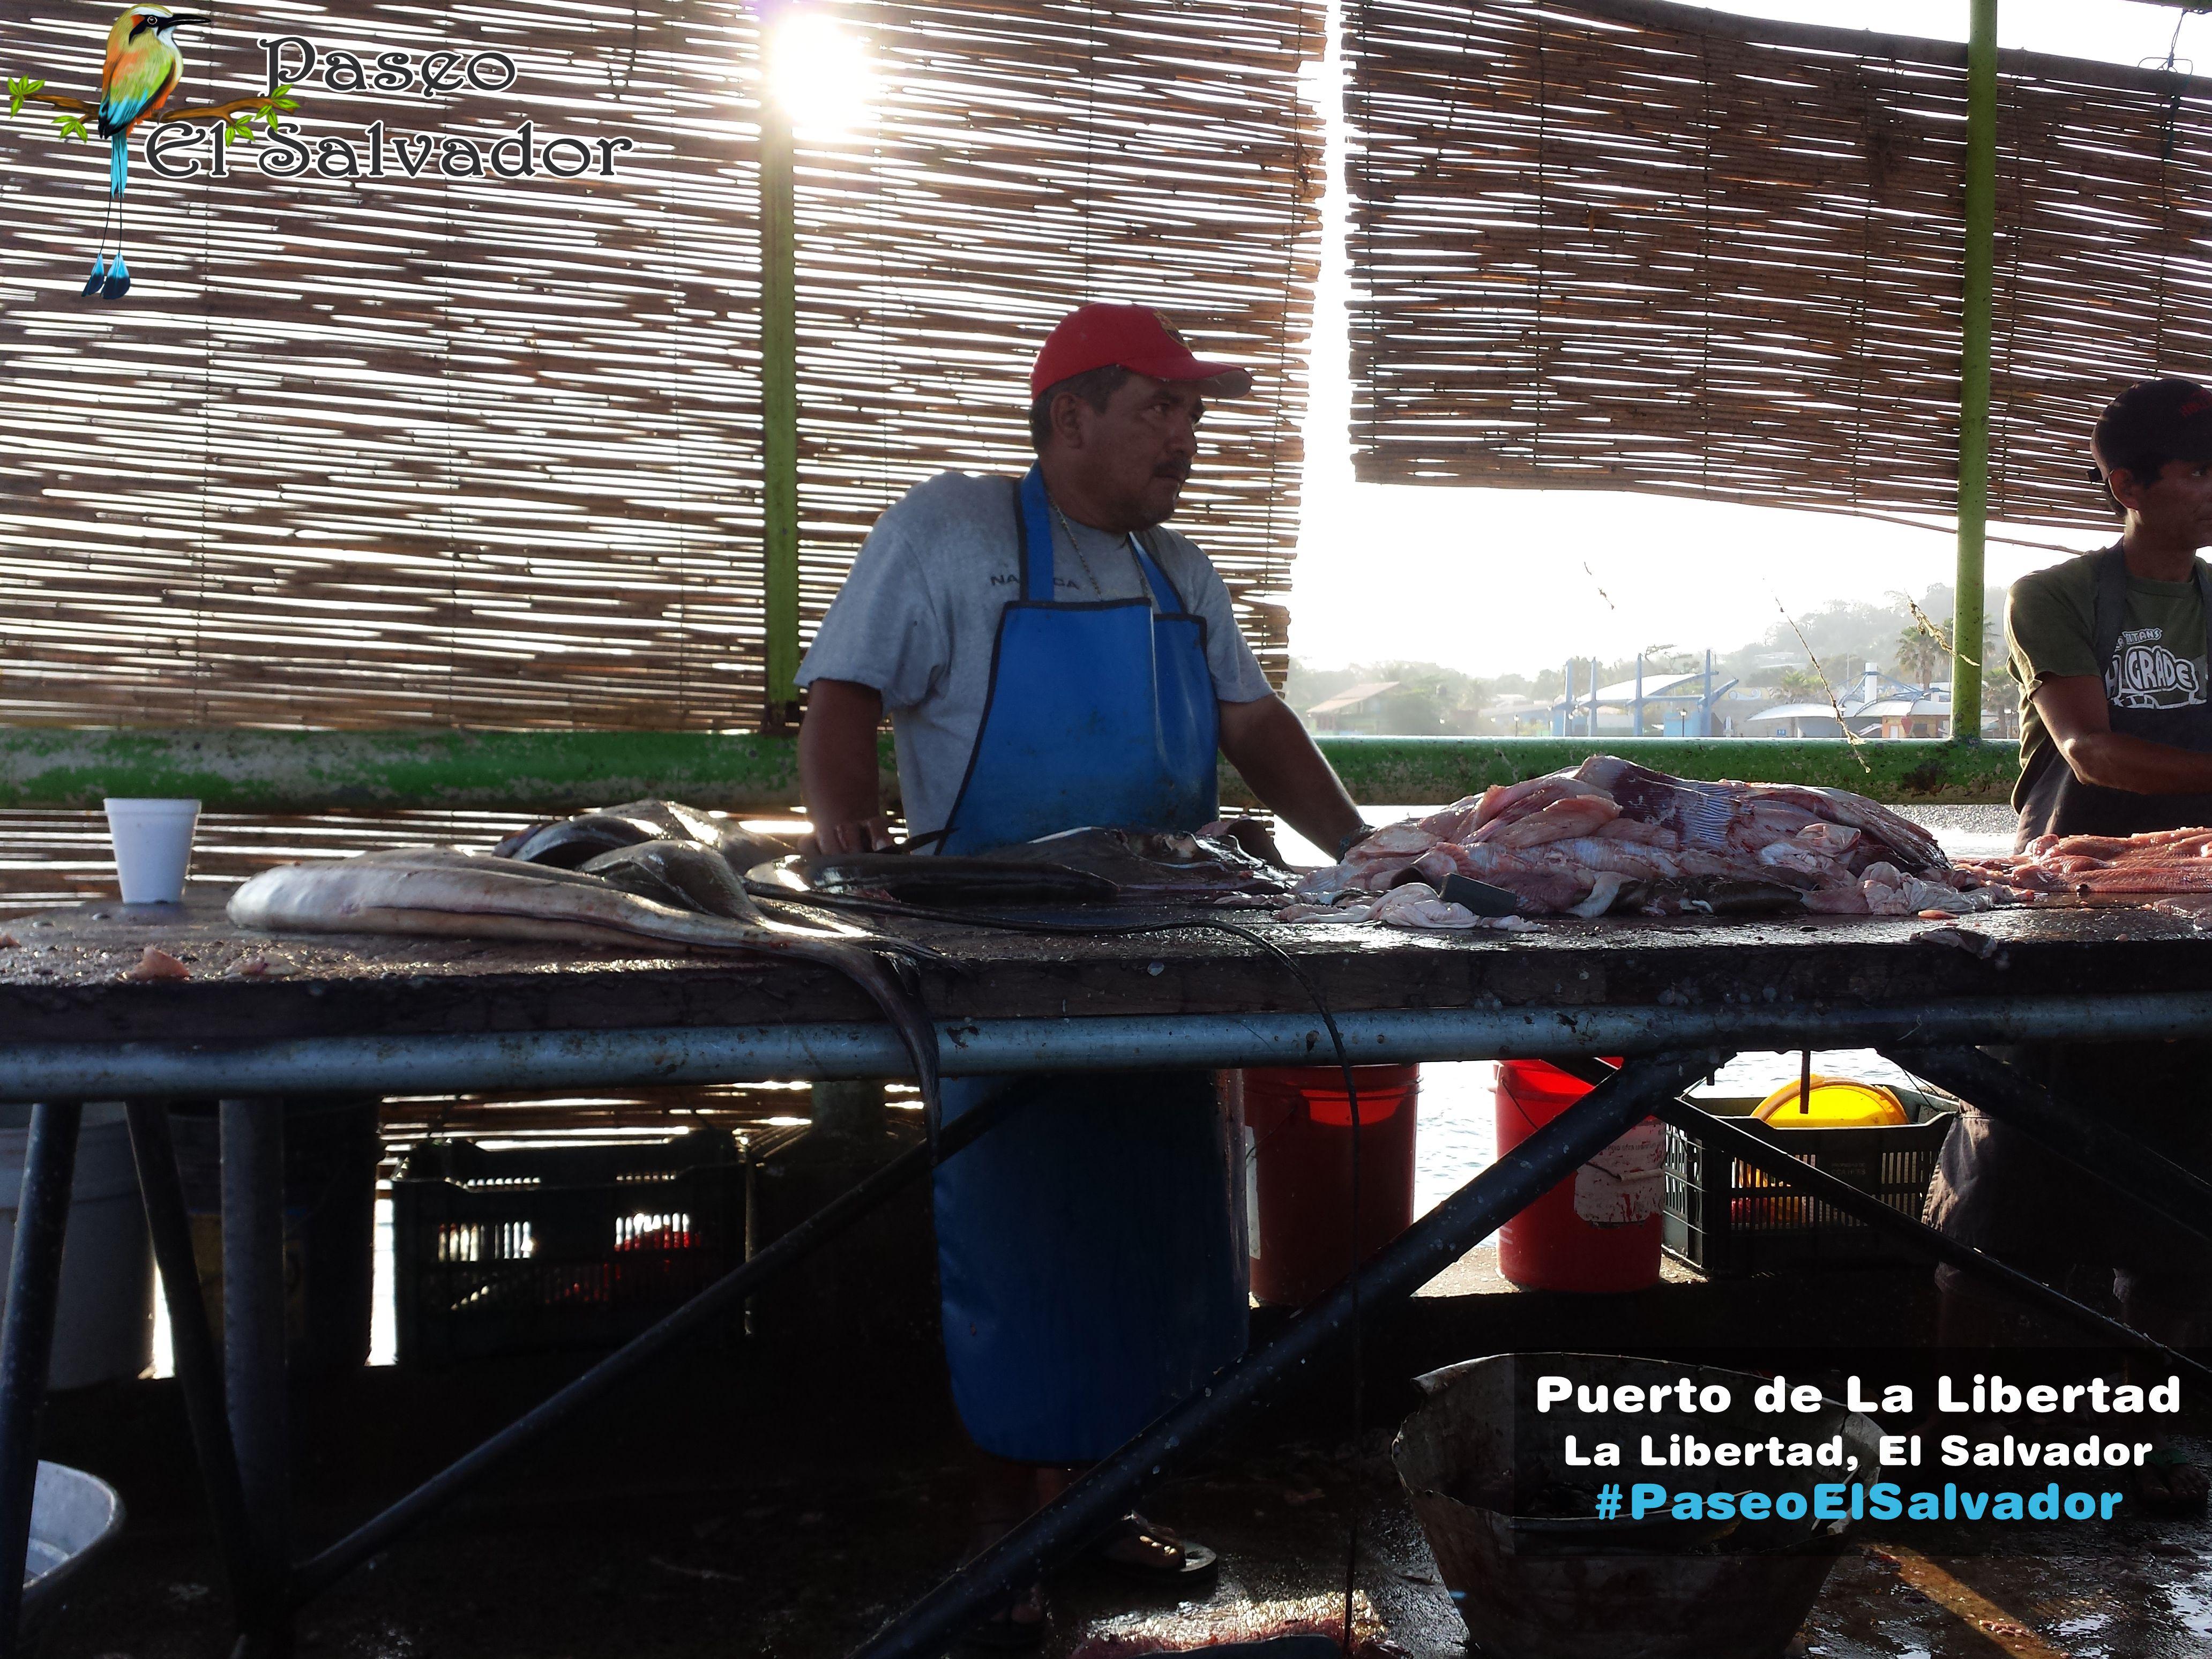 #HazTurismo en #ElSalvador #LaLibertad #Visita #PuertodeLaLibertad  #PaseoElSalvador